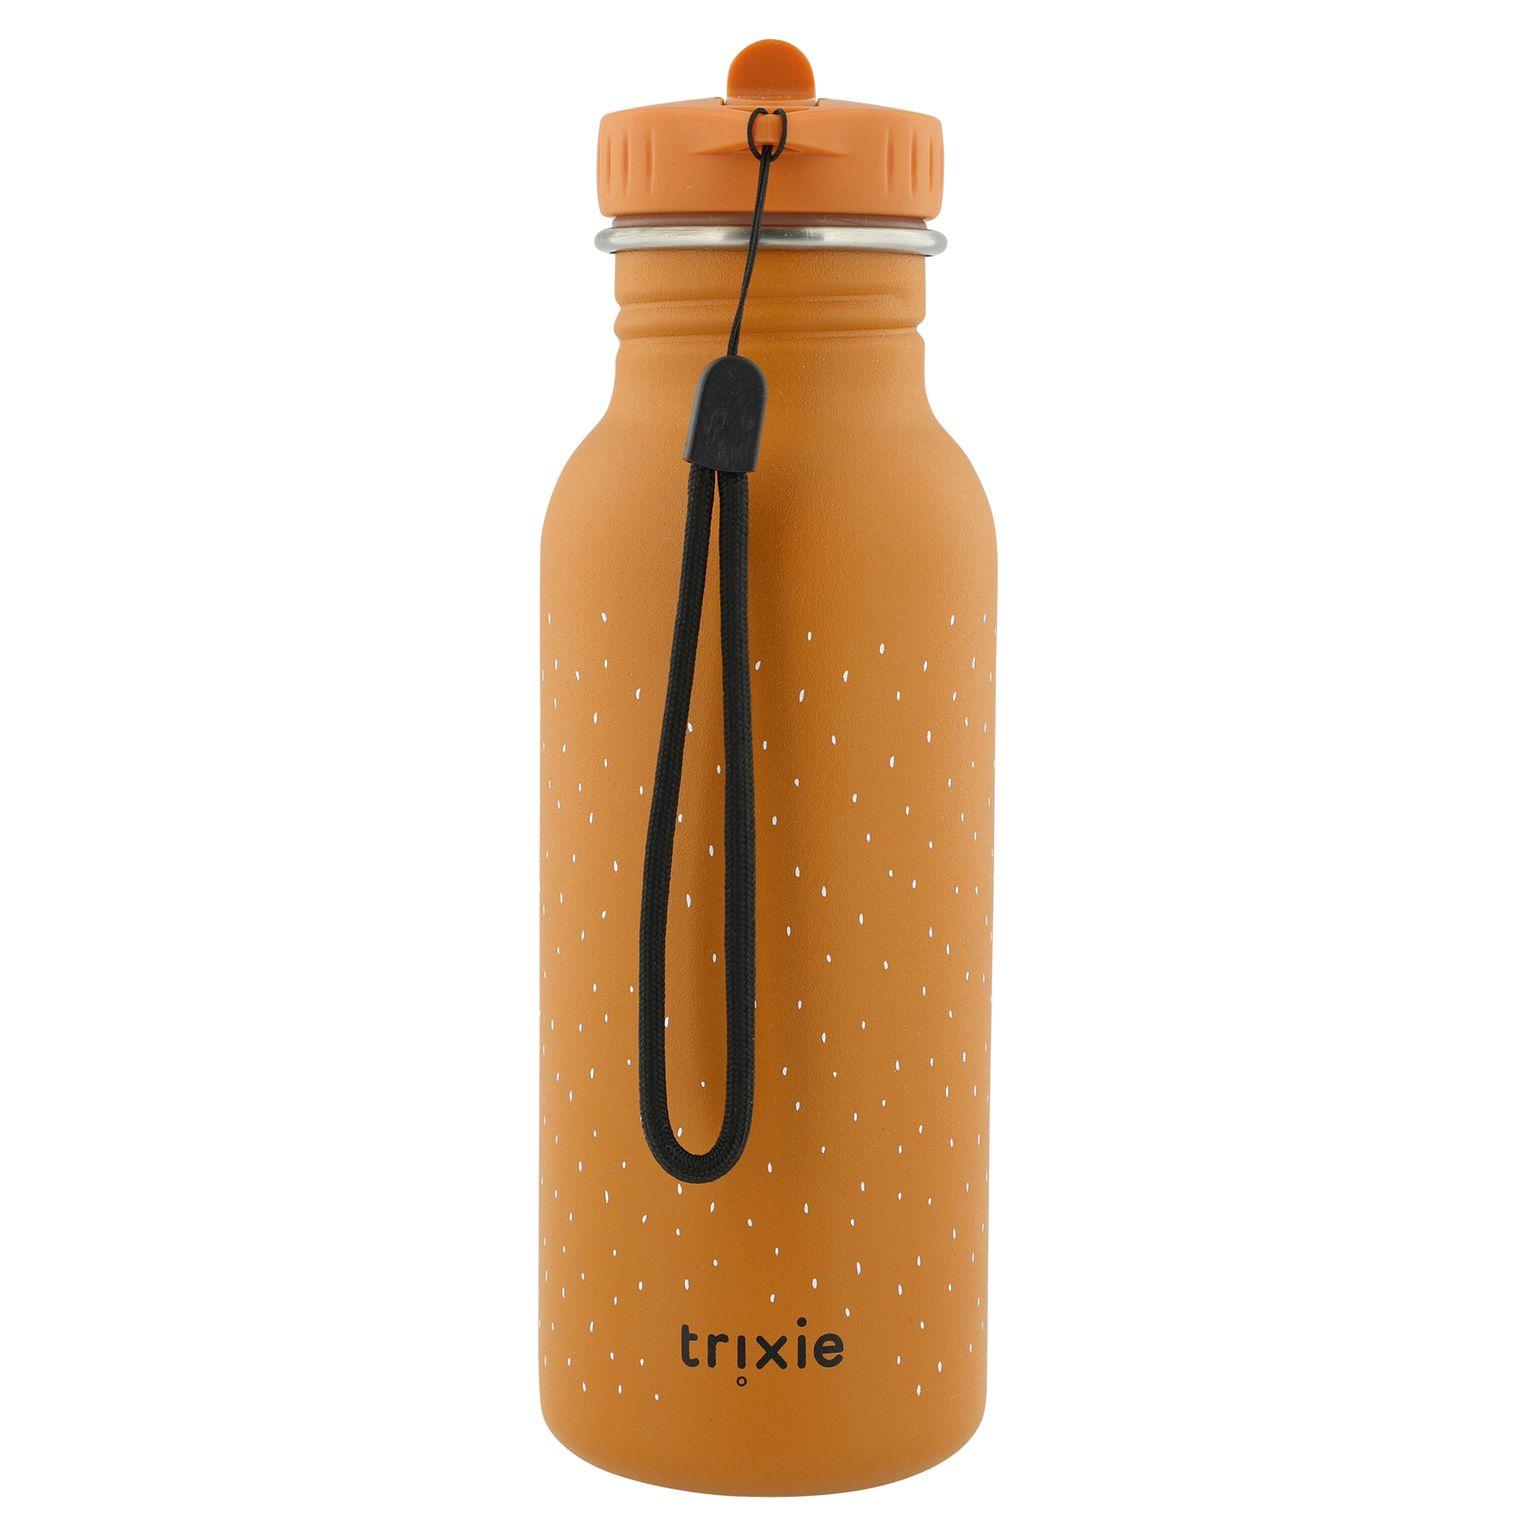 Afbeelding Trixie drinkfles 500ml – Mr Fox